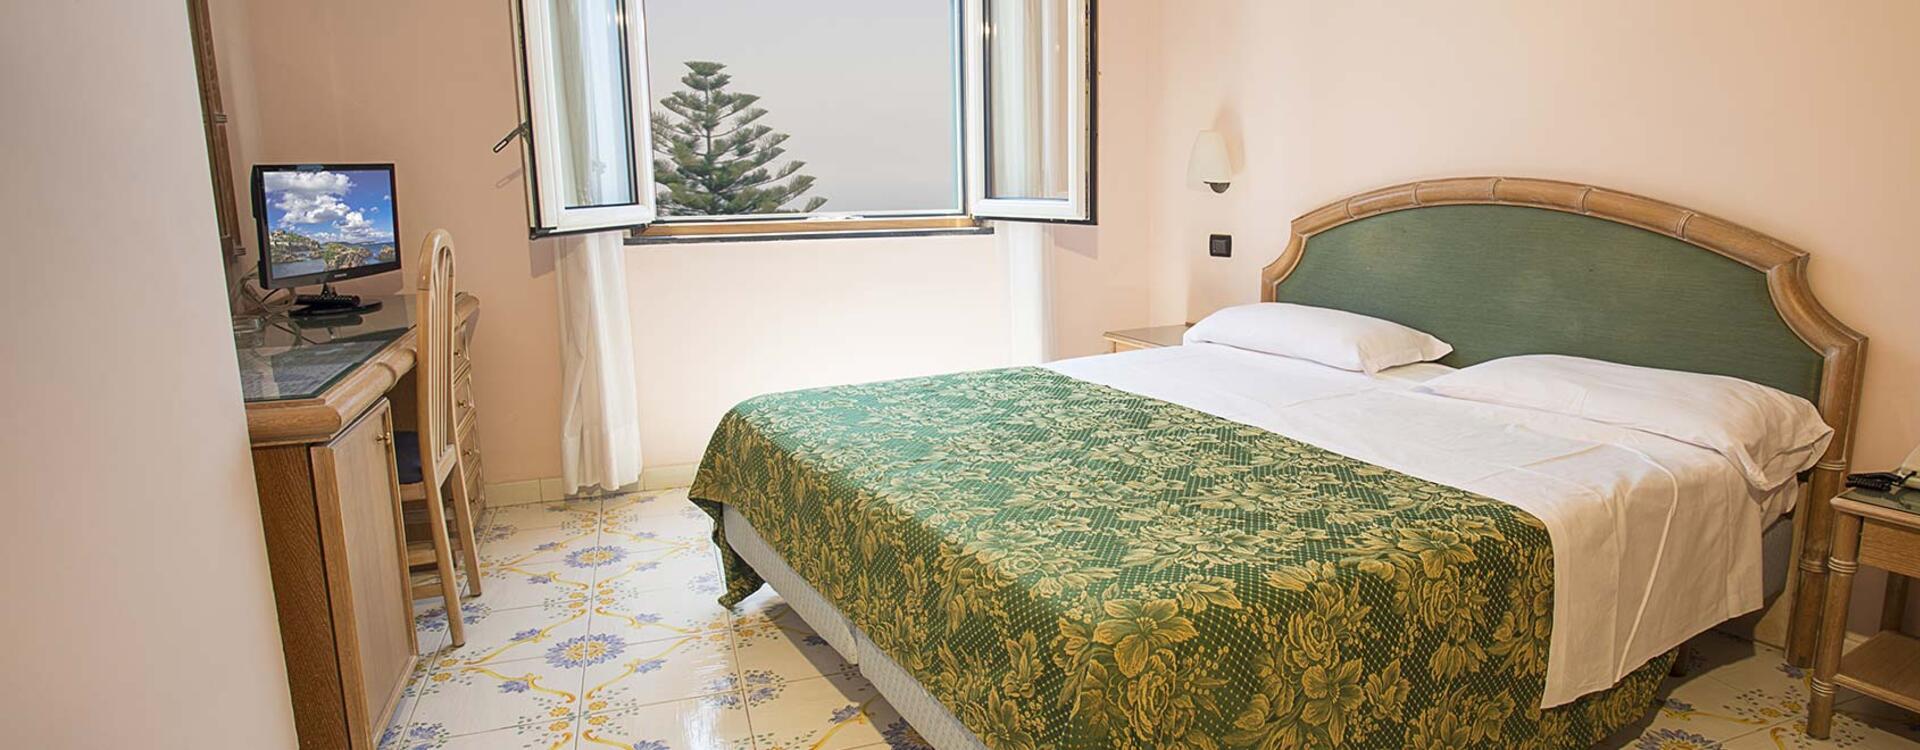 hotelsaintraphaelischia it camere-hotel-ischia 009